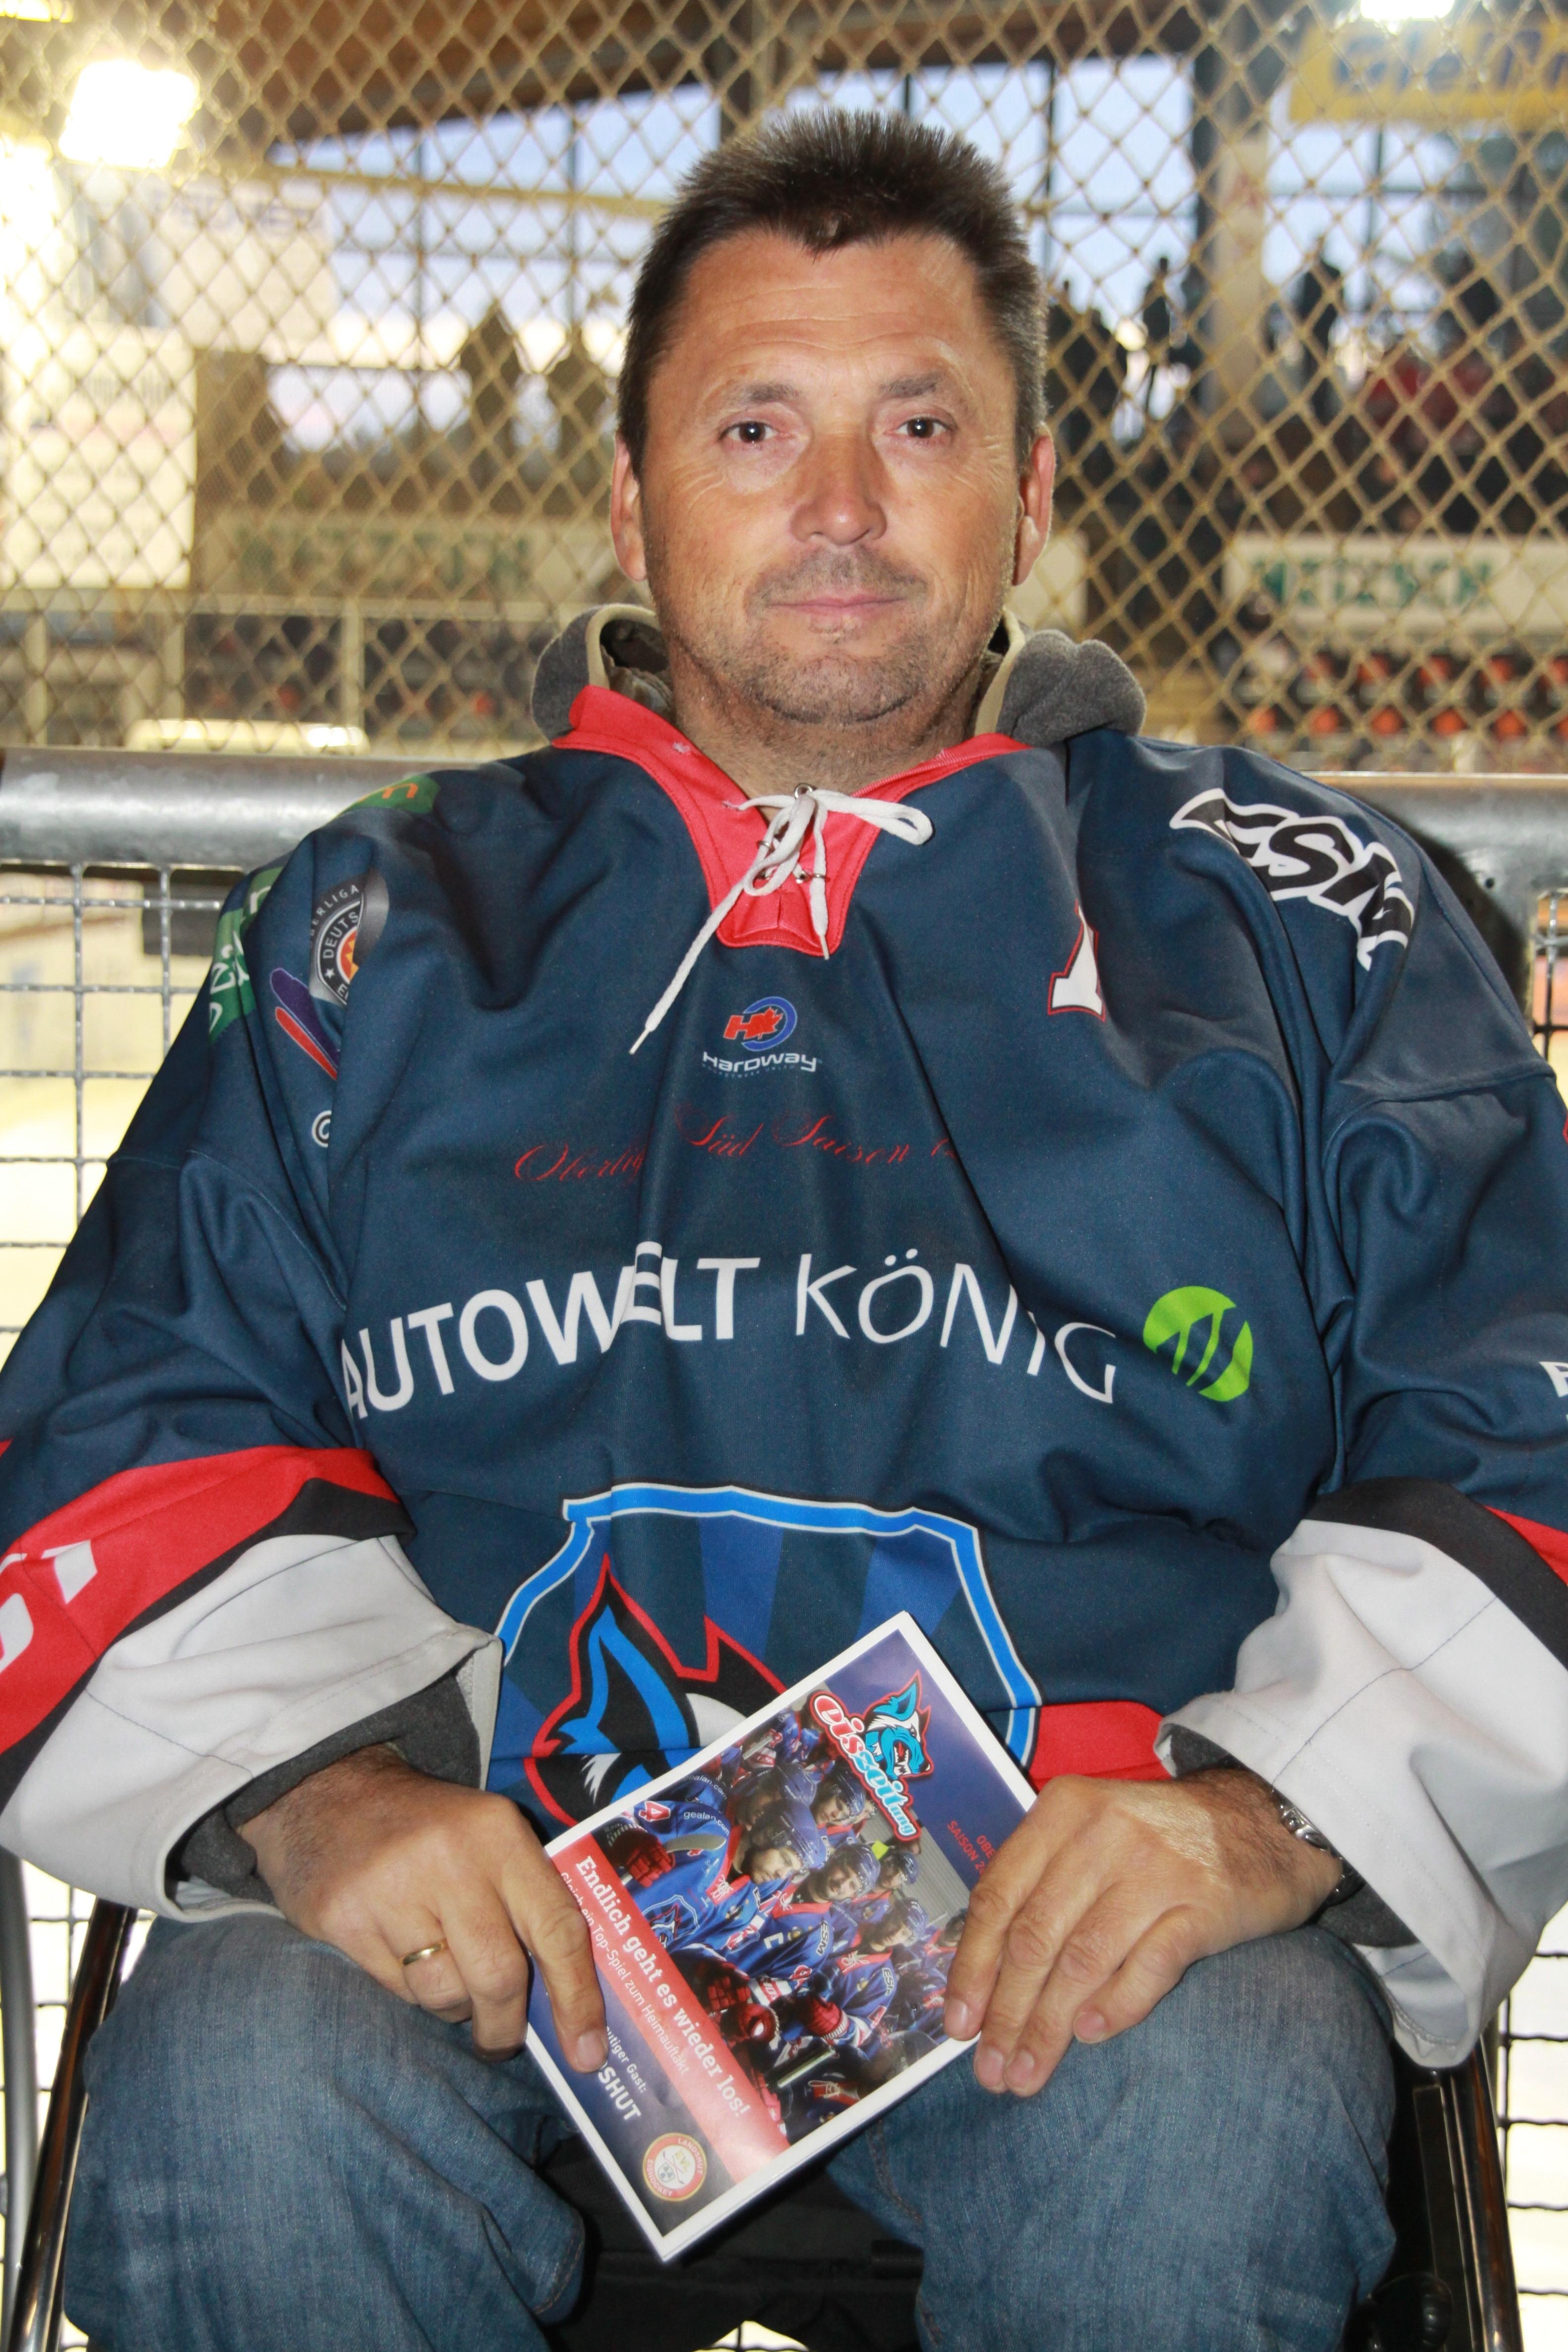 Webmaster Karlheinz Herold